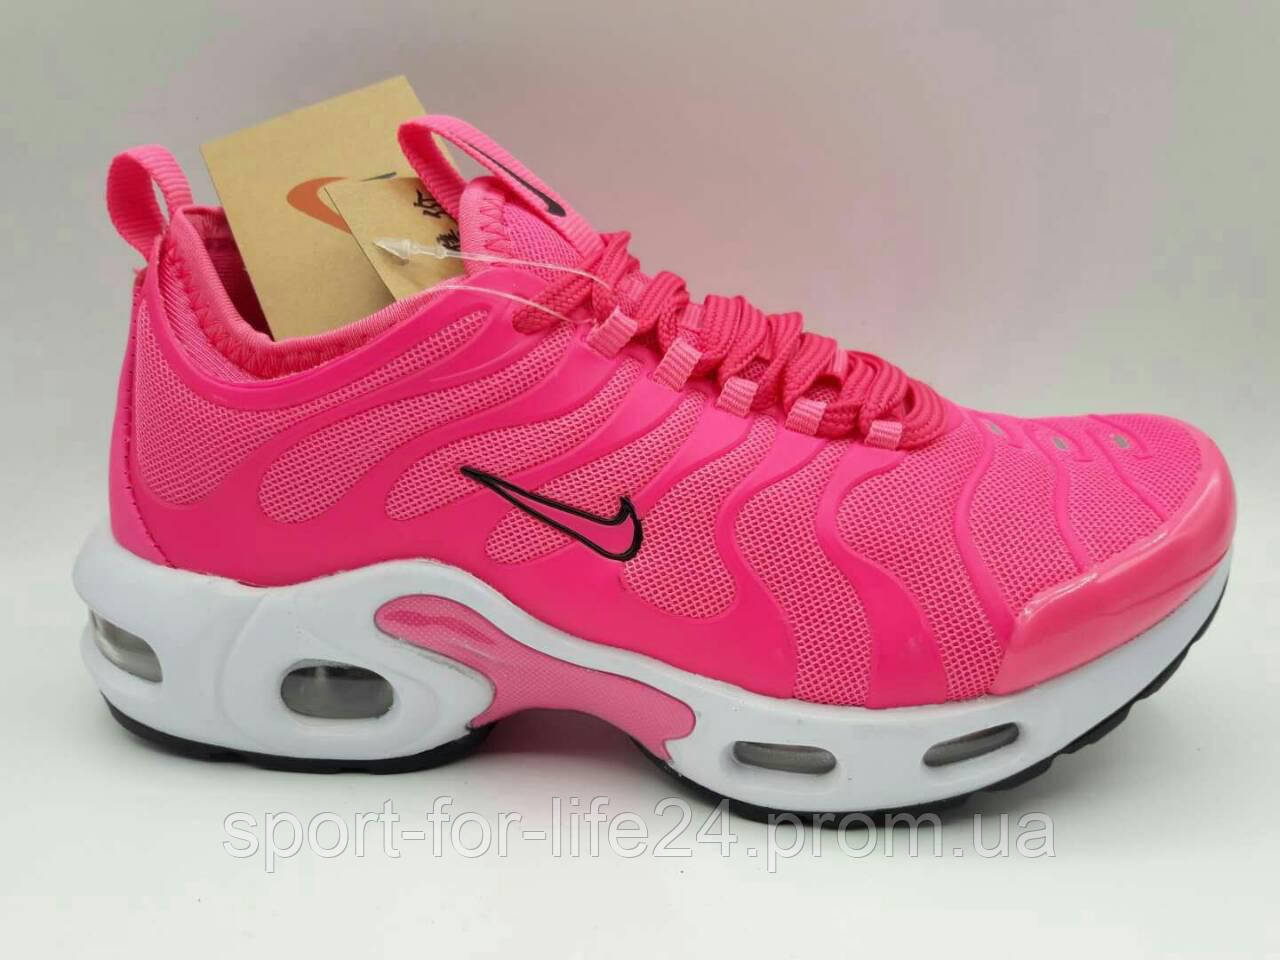 b7006152 Женские кроссовки Nike Air Max TN Plus Pink реплика - Sport for Life в  Сумской области